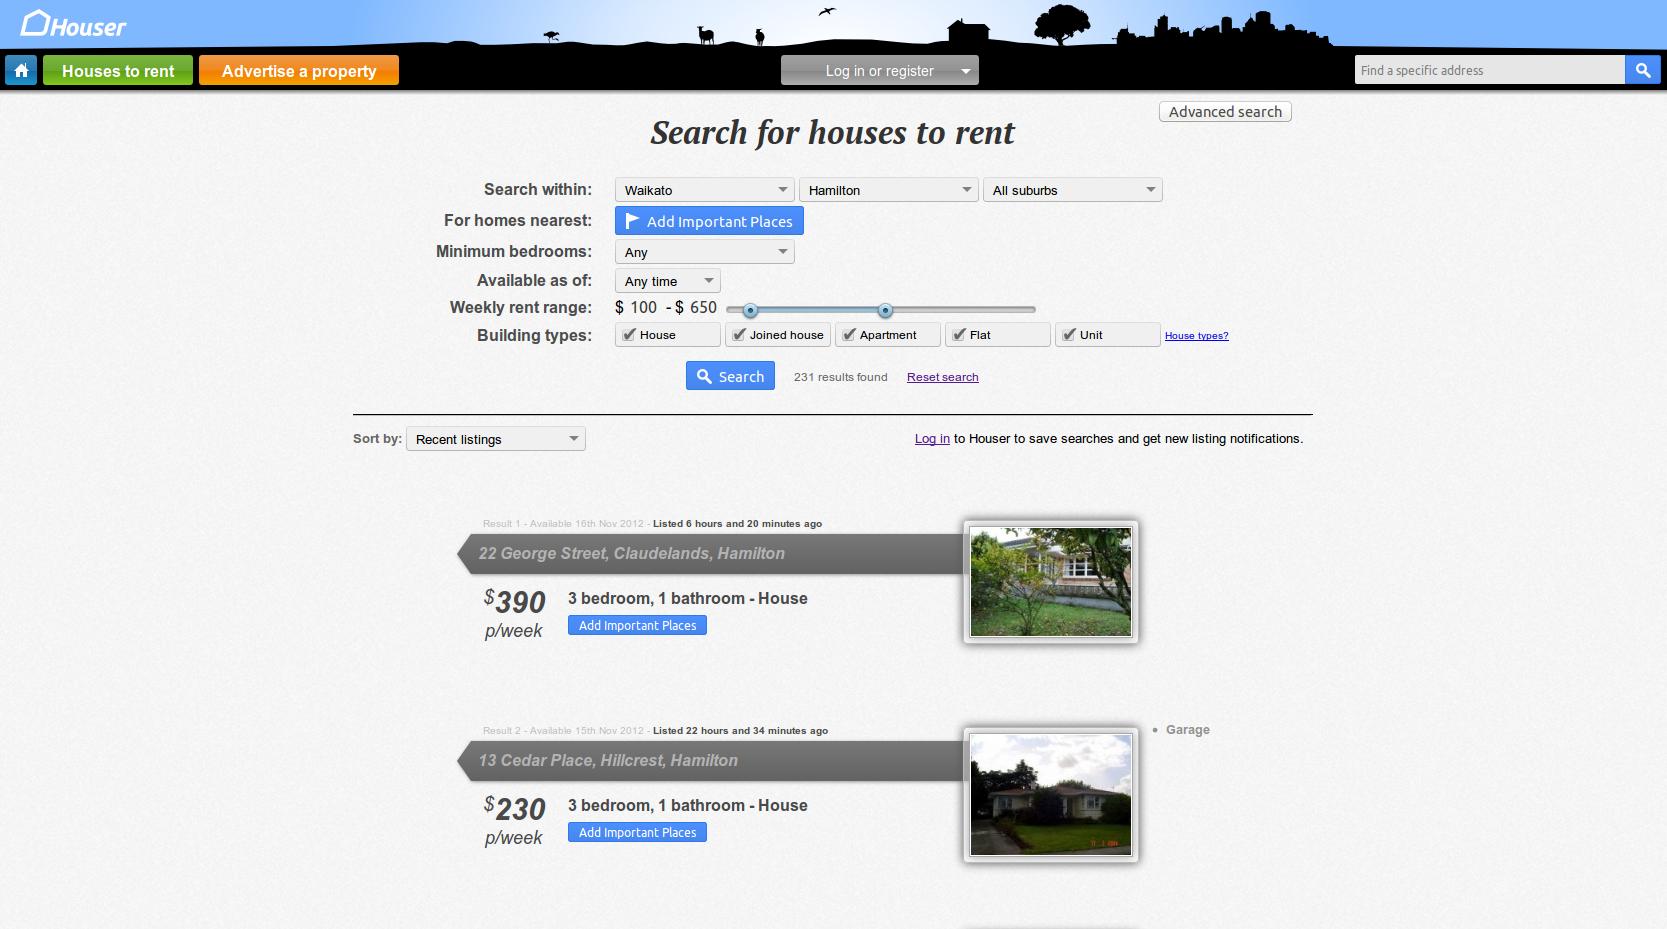 Houser Screenshot Search